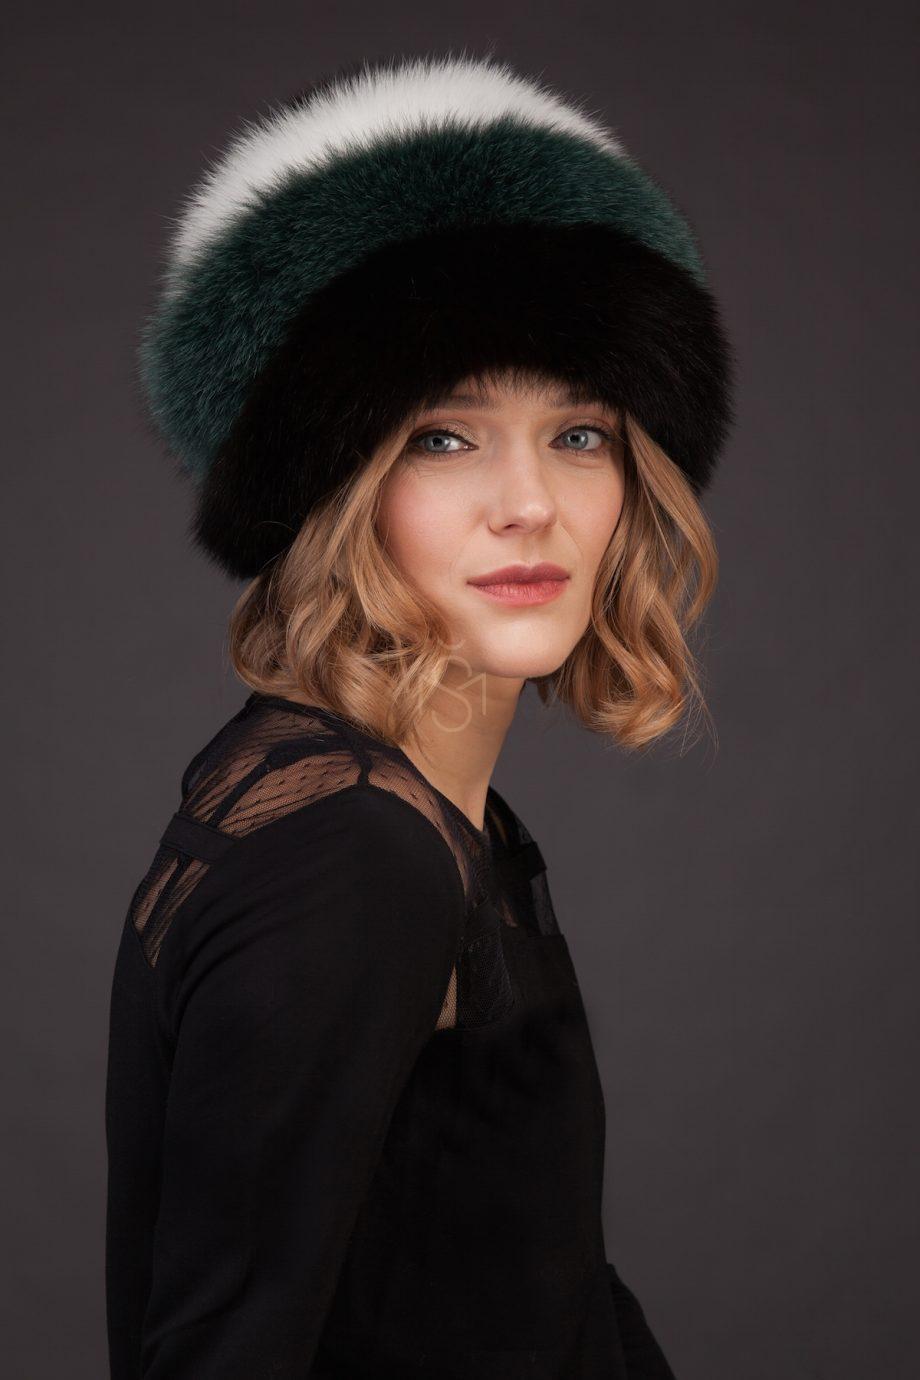 Contrast fox fur hat with pom-pom made by SILTA MADA fur studio in Vilnius